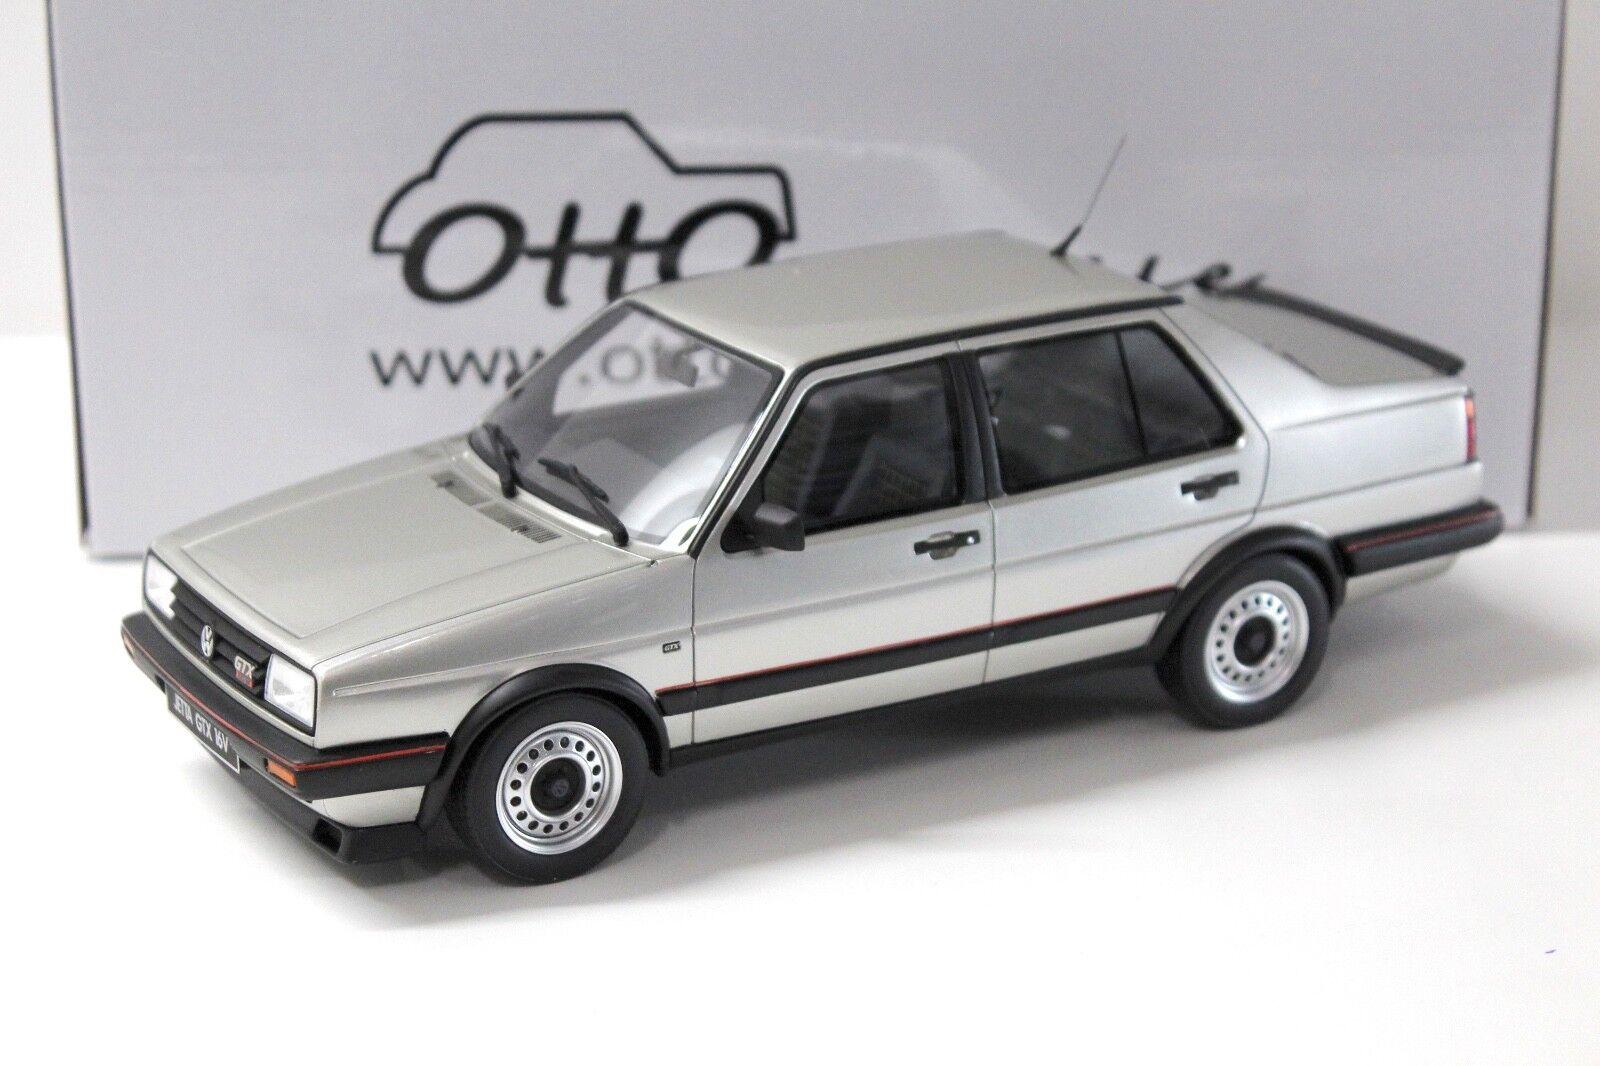 ahorra 50% -75% de descuento 1 18 Otto VW VW VW Jetta MKII GTX 16v sedan plata New en Premium-modelCoches  descuento